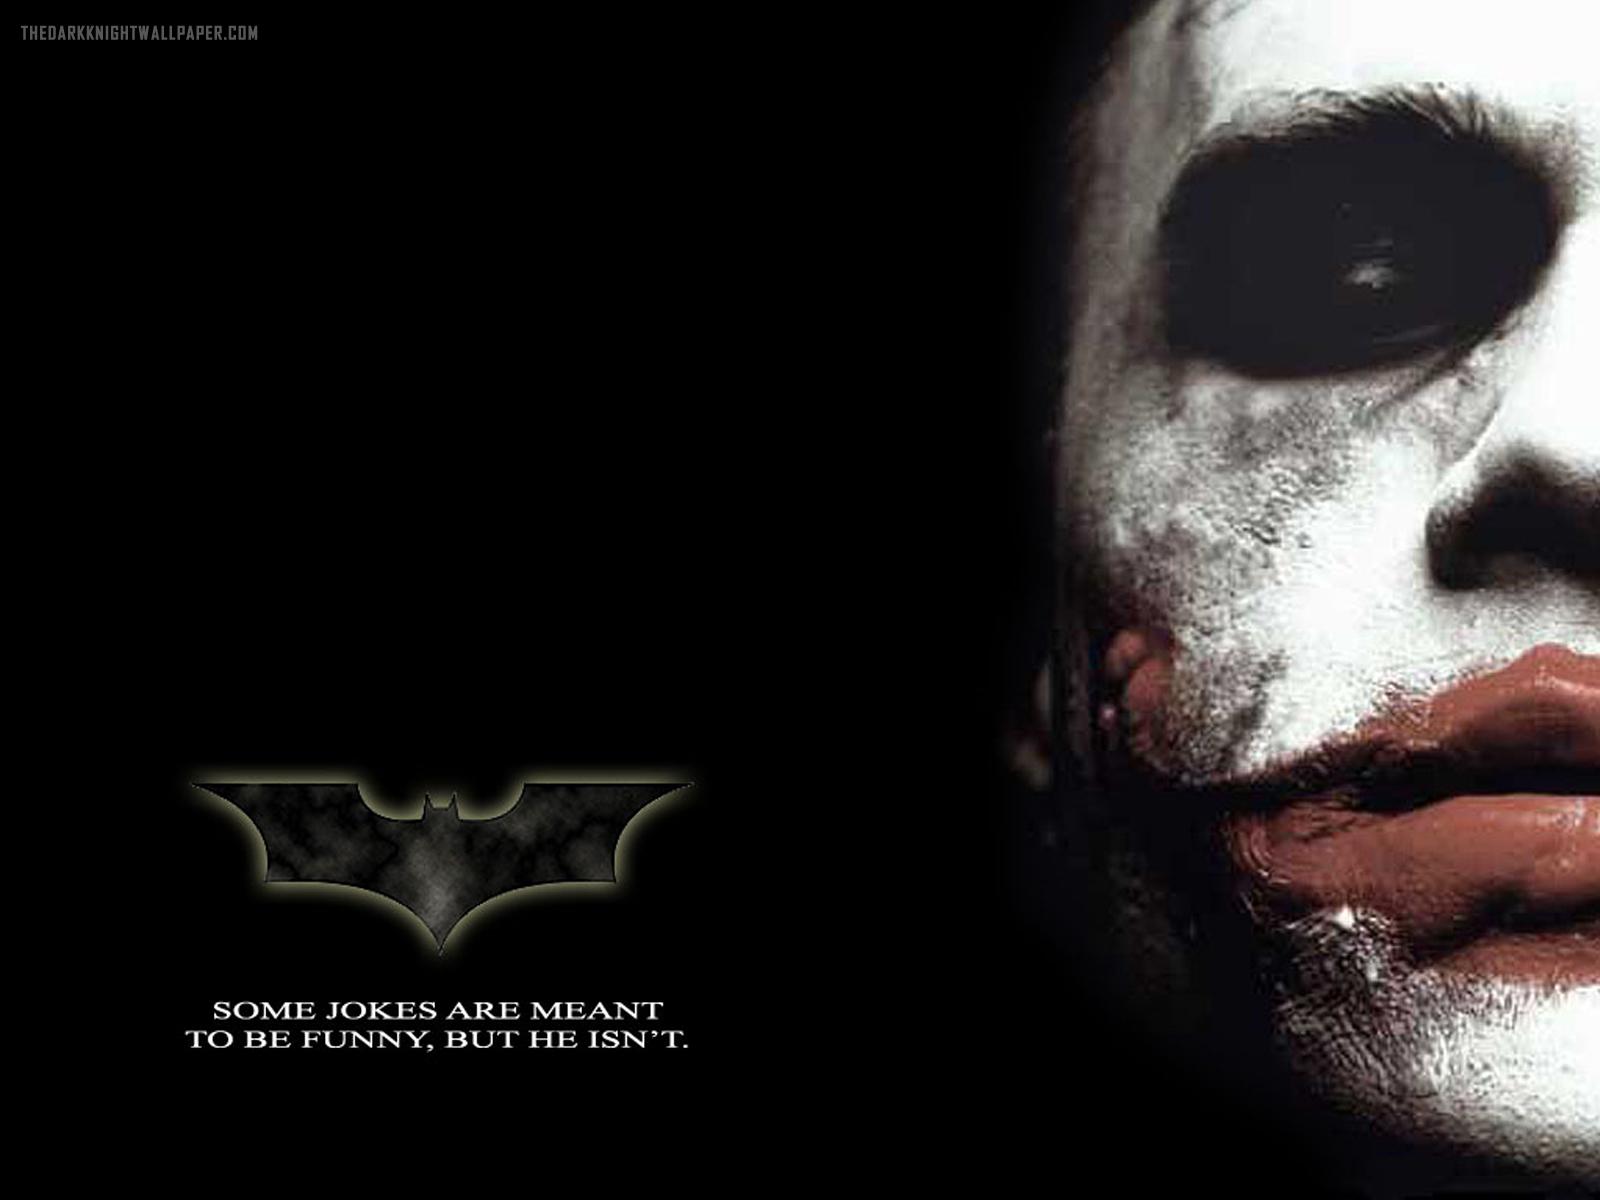 Joker Quotes Wallpaper Hd 1080p Joker 4k Hd Desktop Wallpaper For 4k